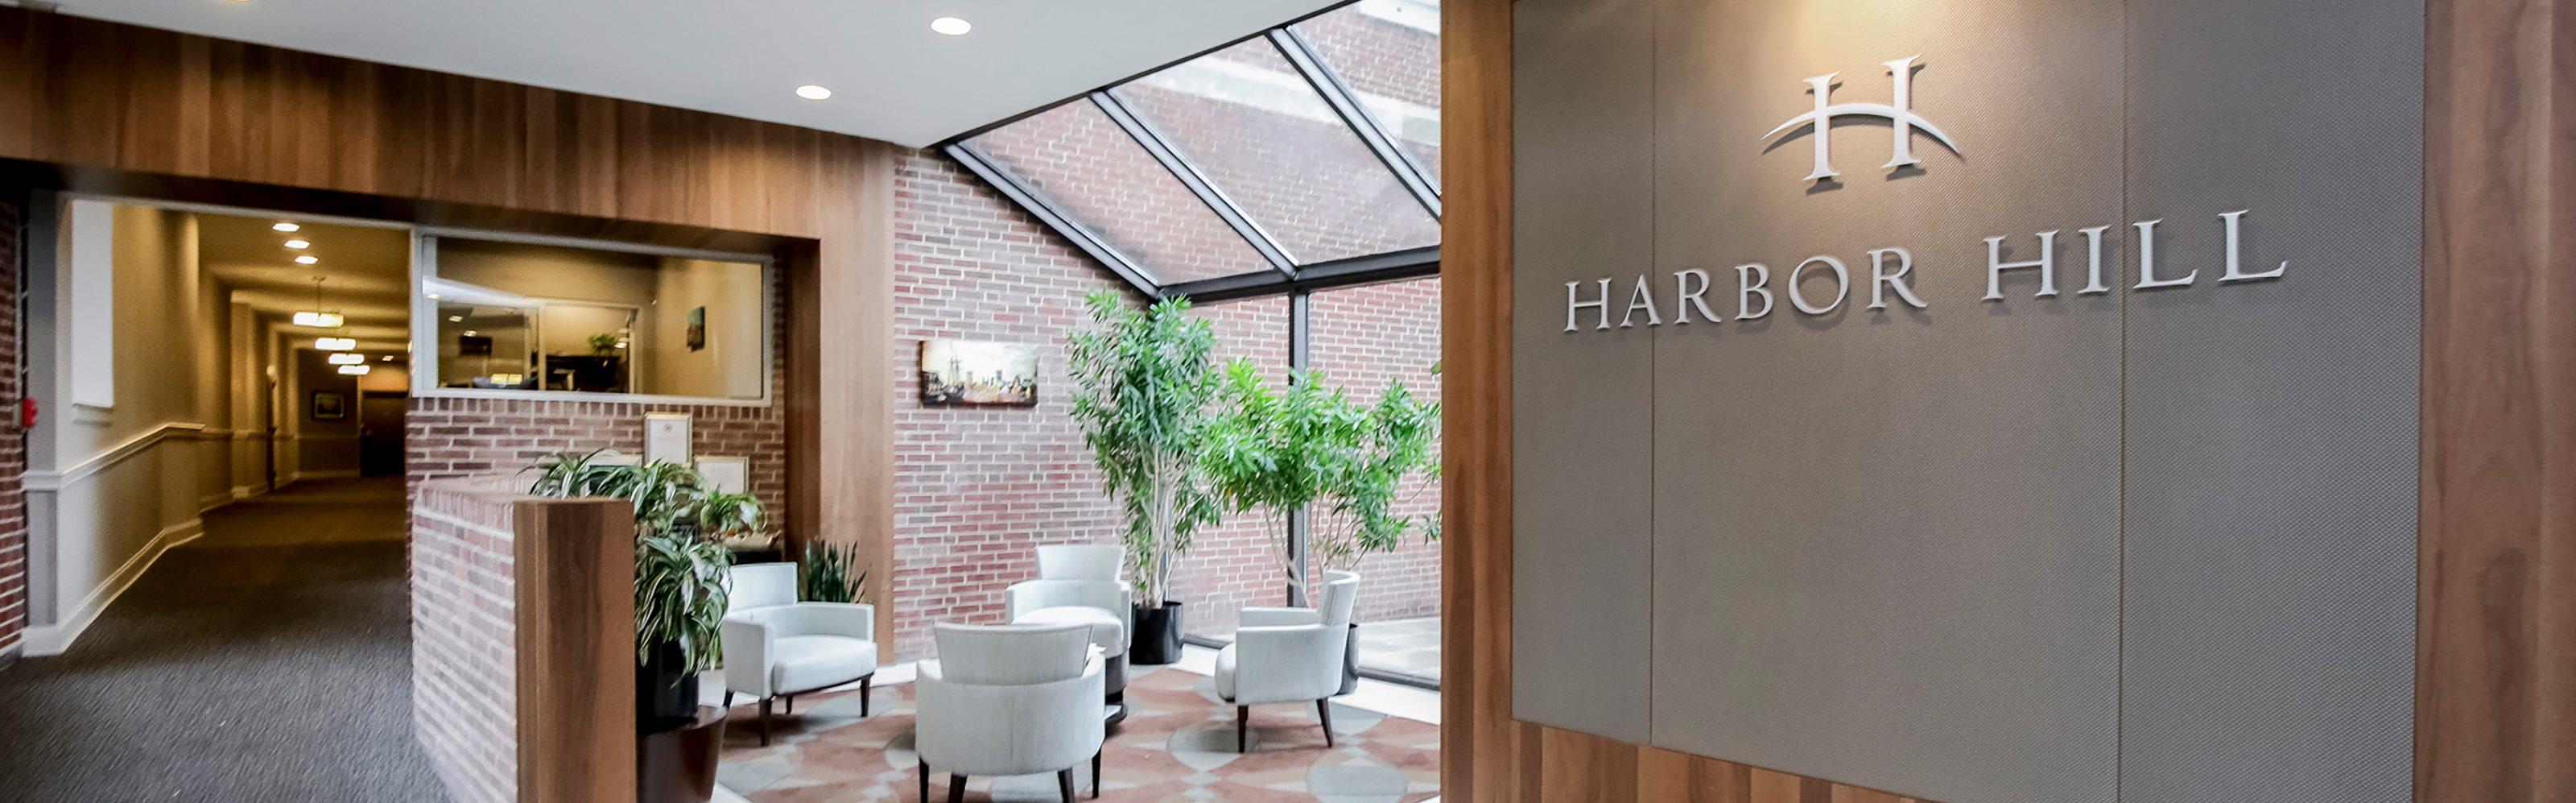 Harbor Hill Apartments interior